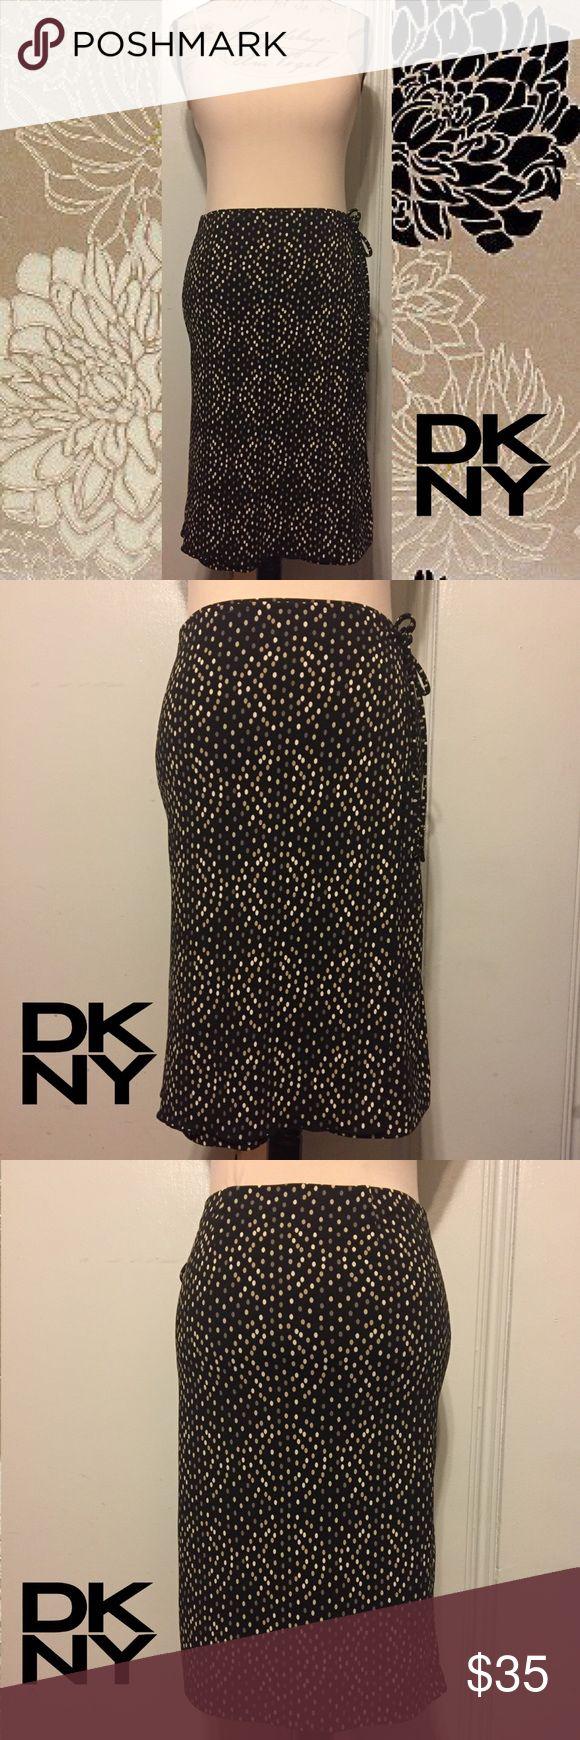 "DKNY Classy Black/Cream Polka Dots Wrap Skirt SIZE S. 23"" Length. 15"" Waist. Stretchy Wrap Skirt. Side Tie. Black w Cream, Sepia & Mocha Polka Dots. 100% Polyester. NWOT DKNY Skirts Midi"